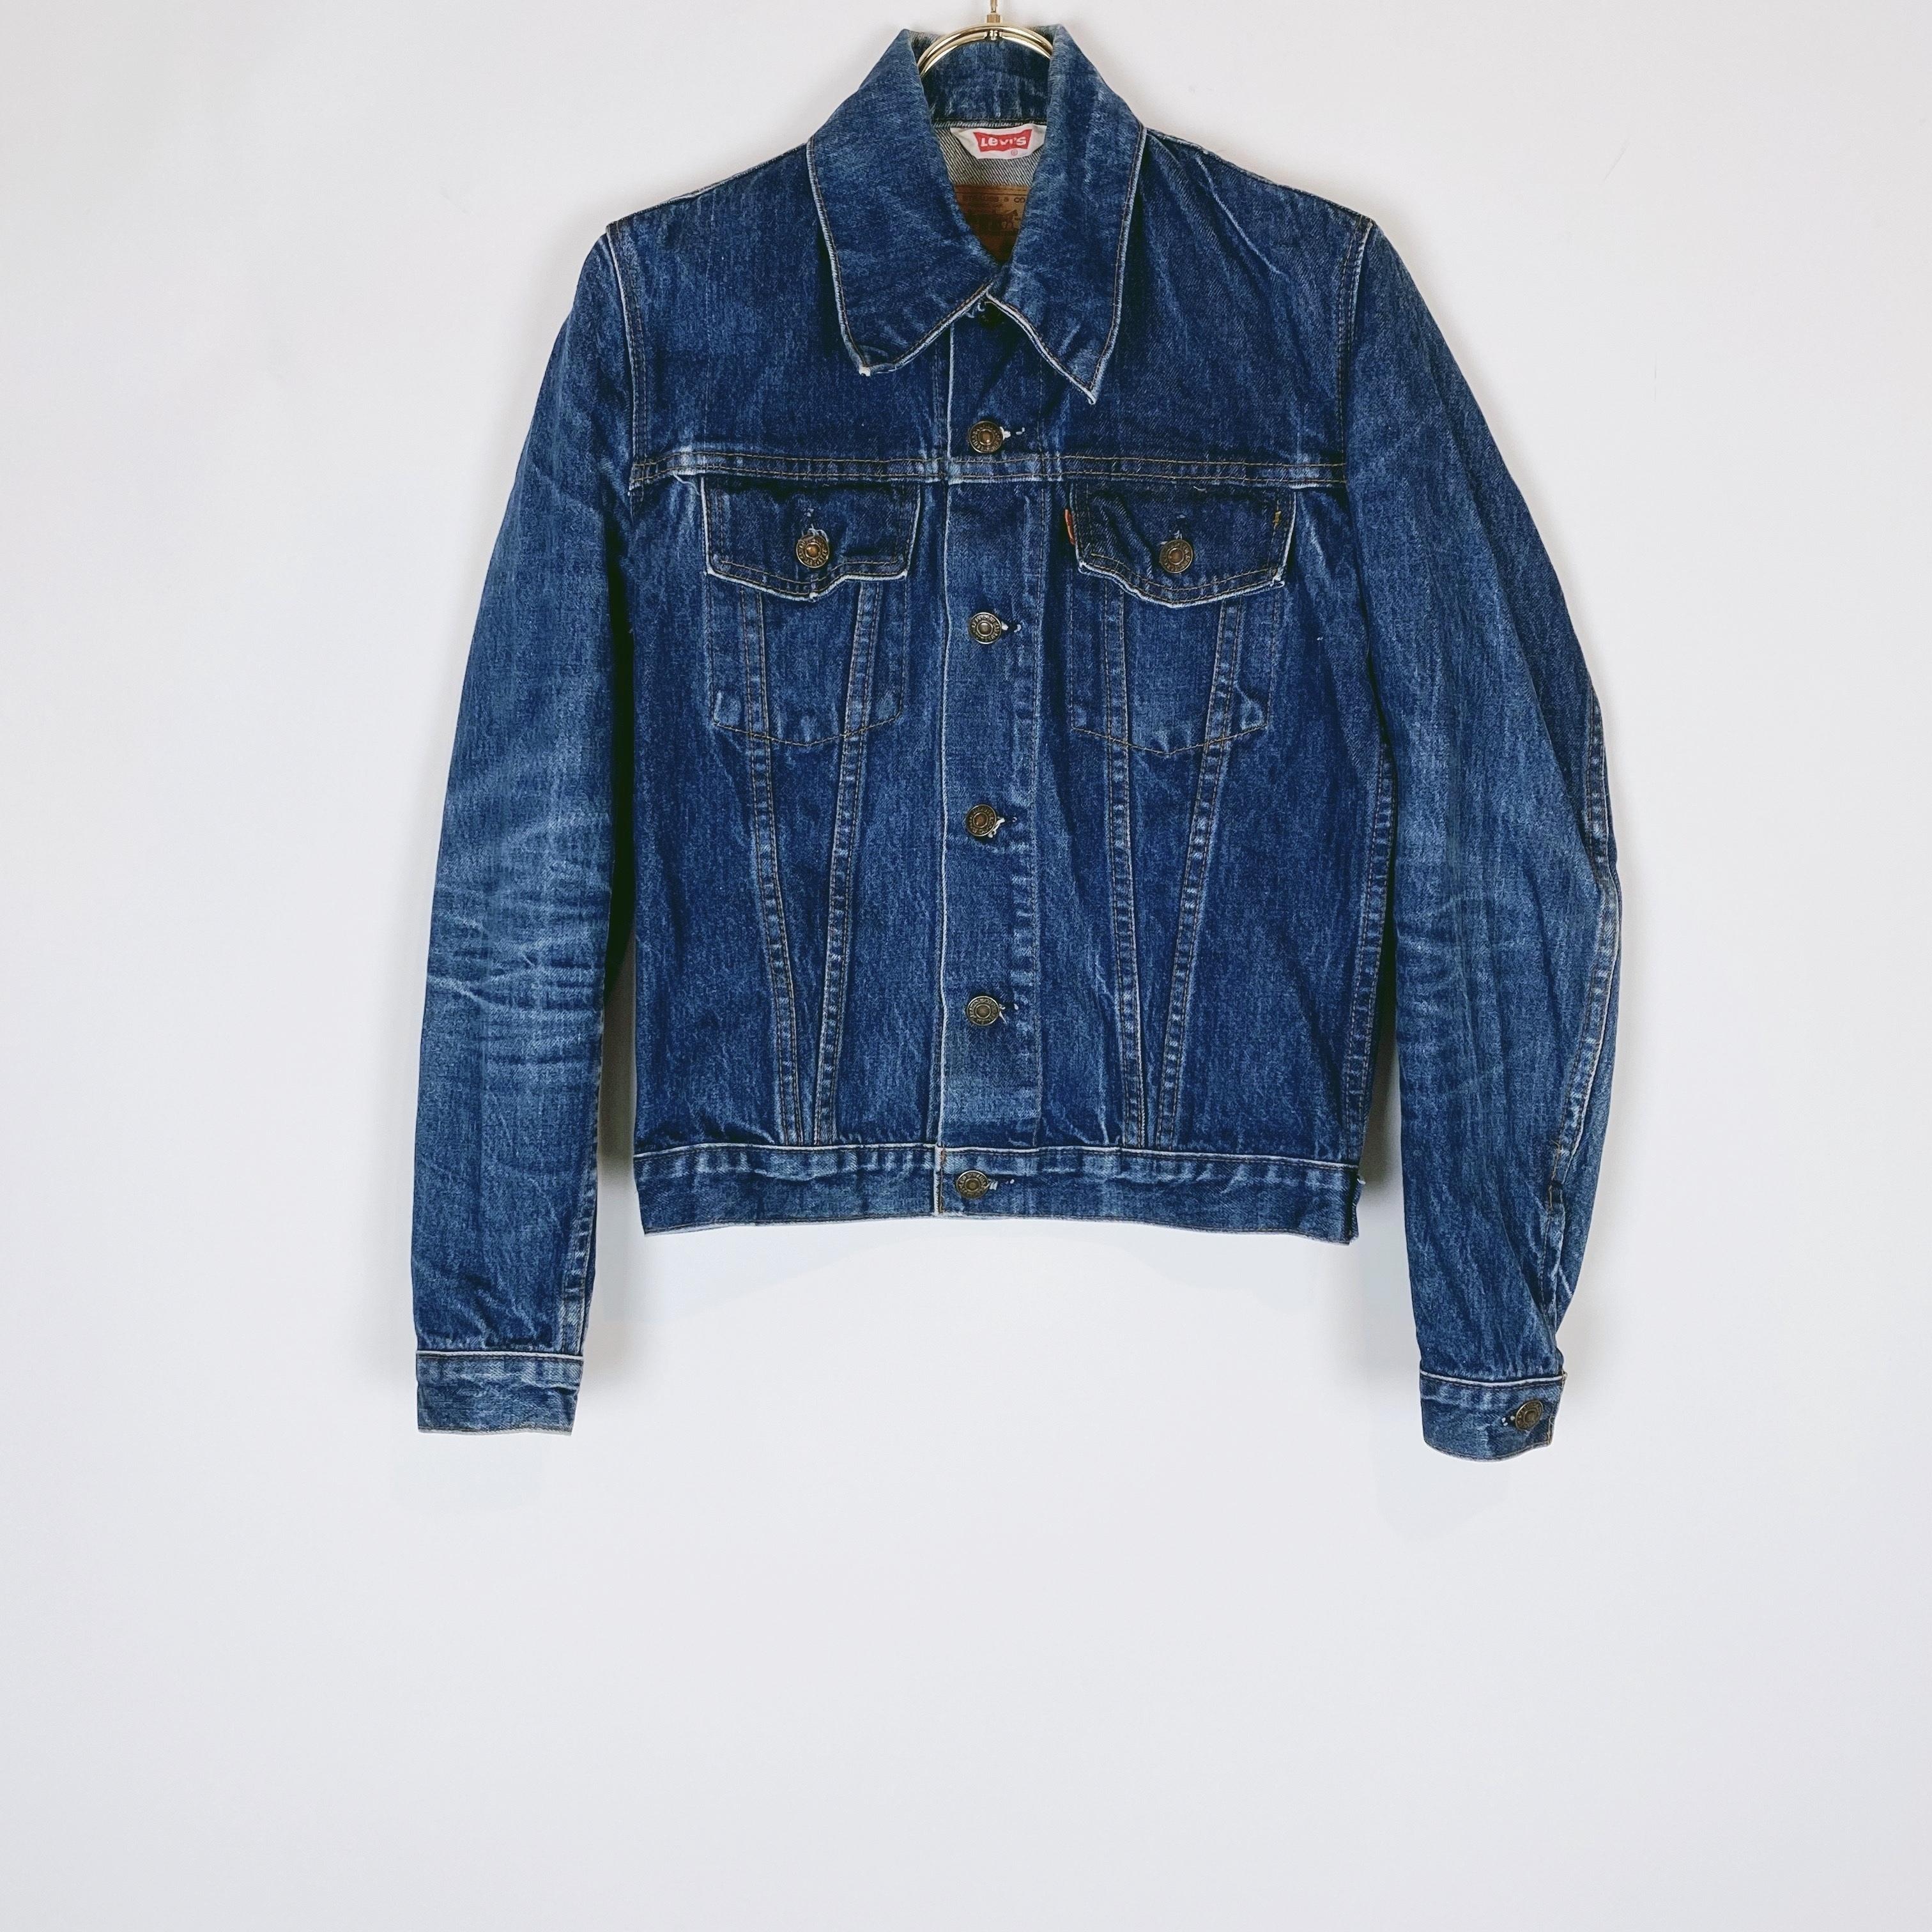 ◼︎70s vintage Levi's orange tab denim jacket from Europe◼︎